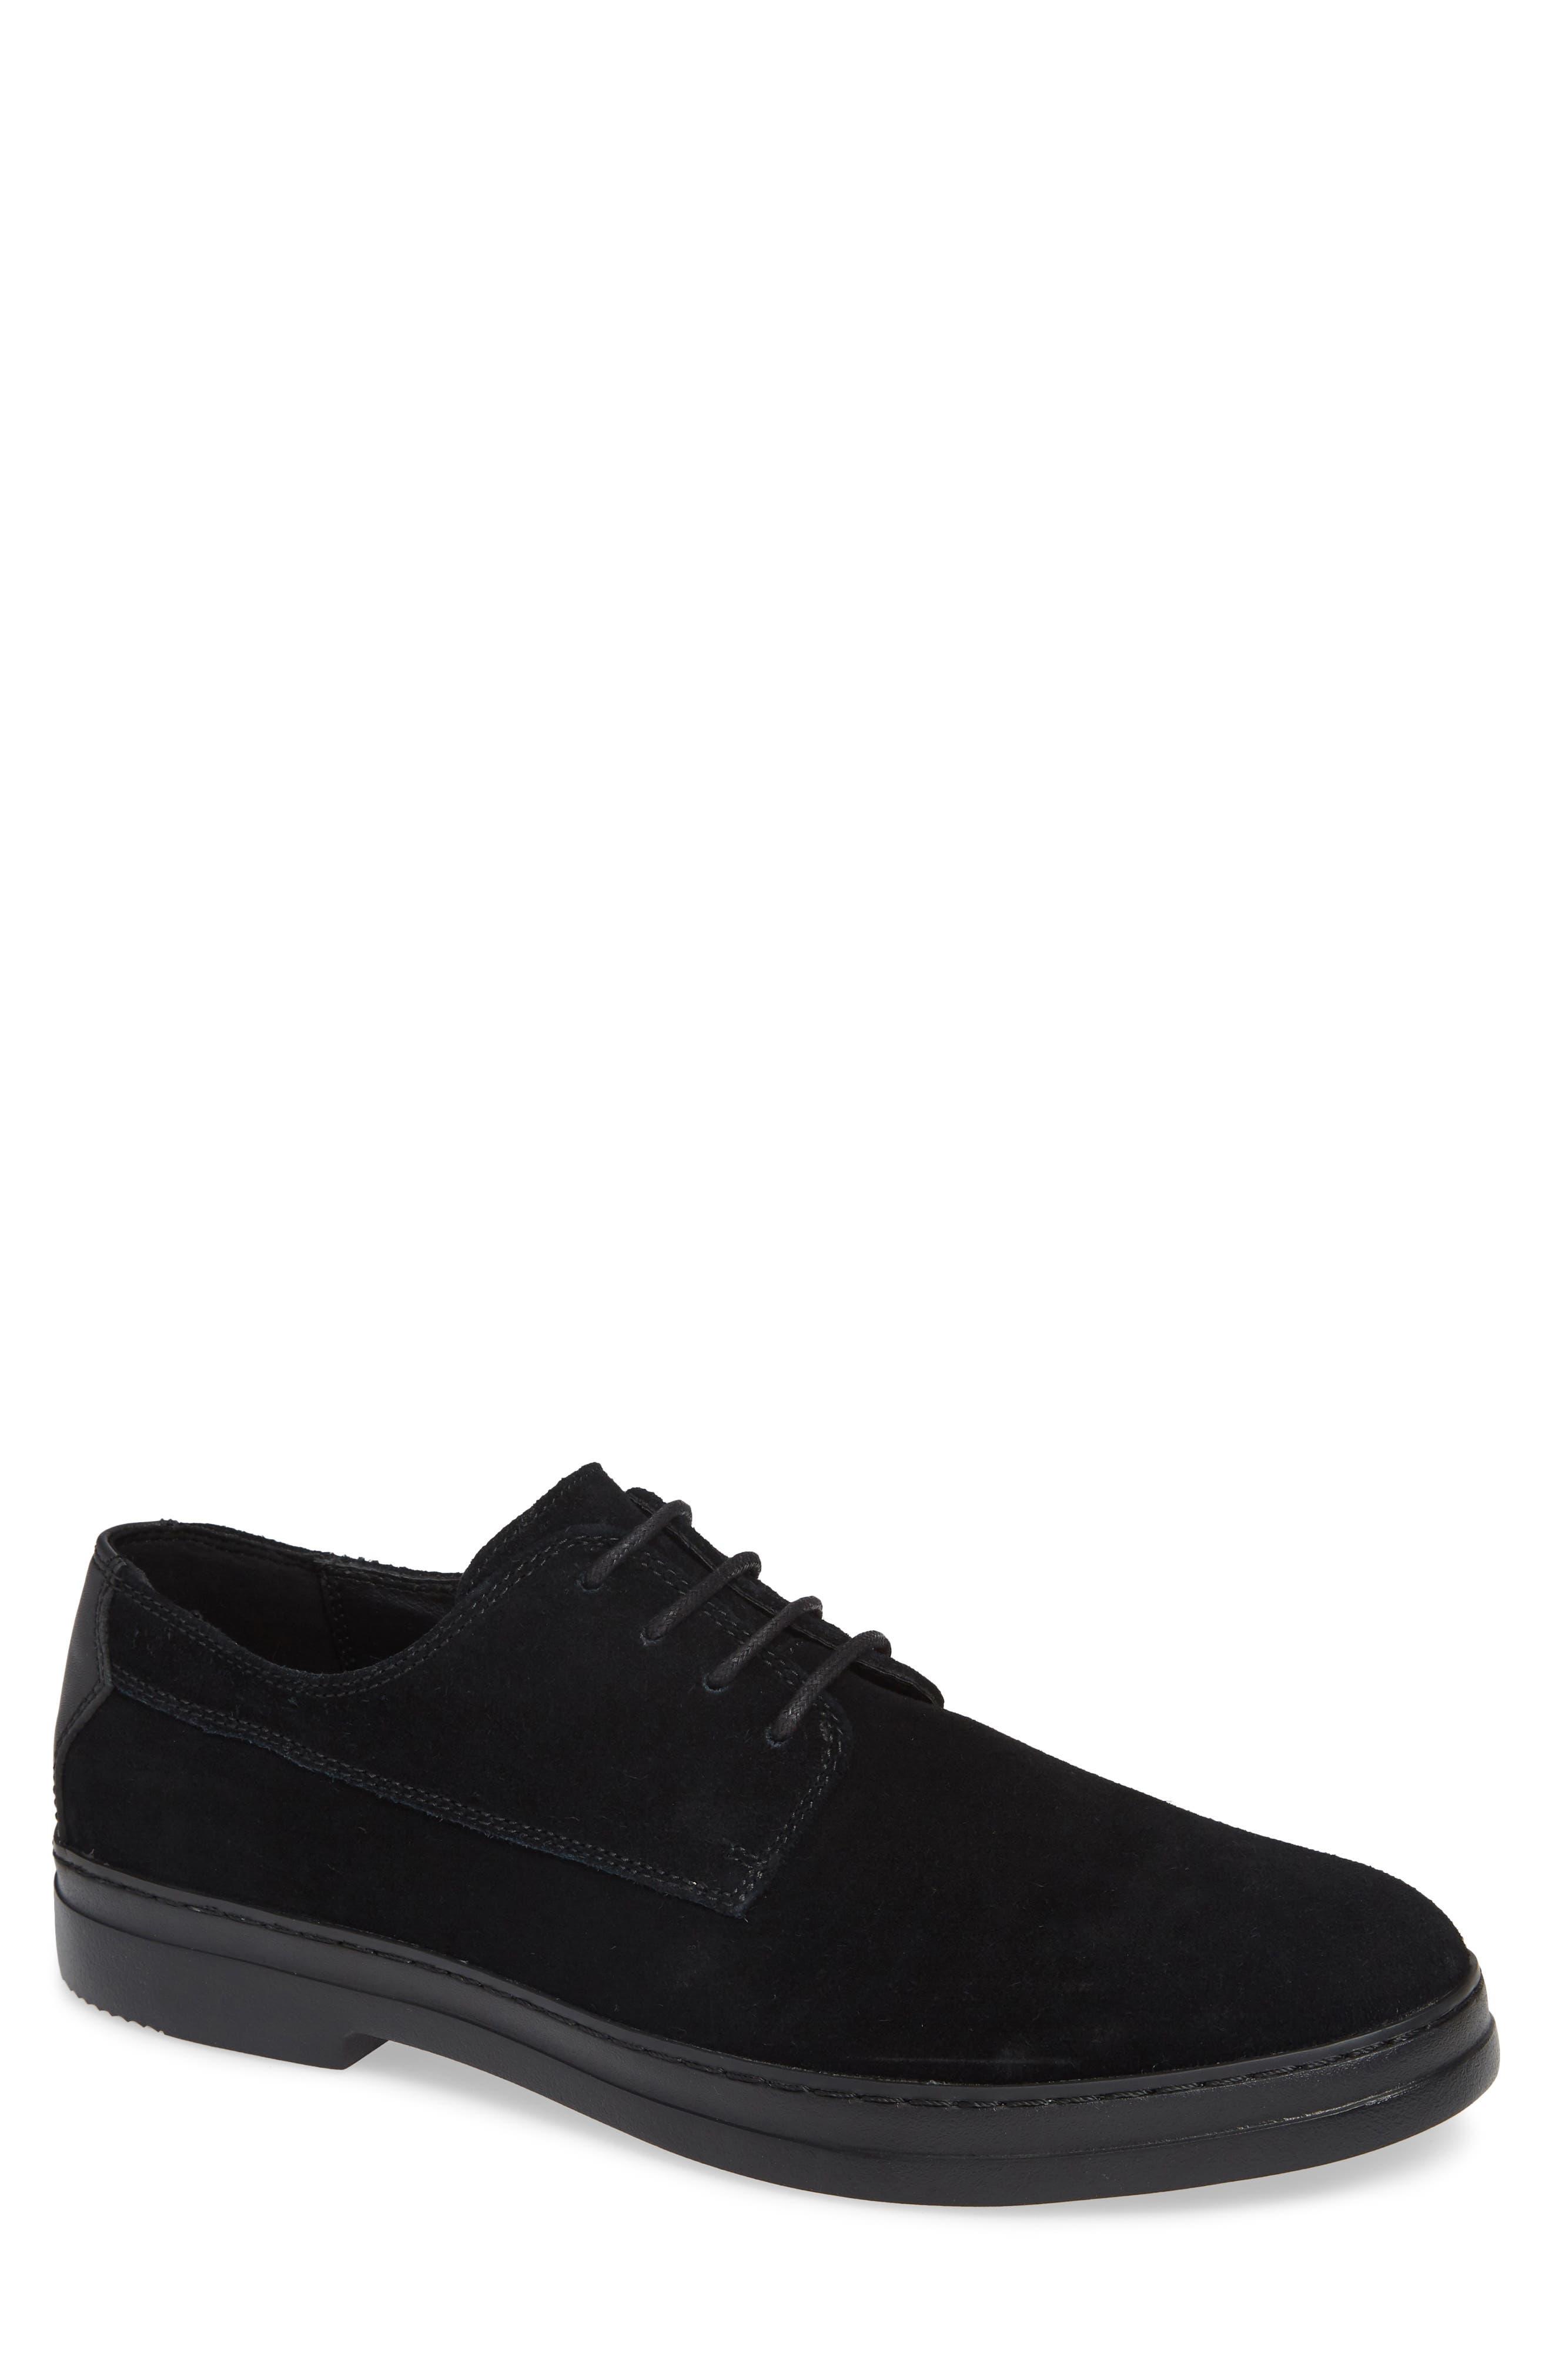 Rickie Buck Shoe,                         Main,                         color, BLACK CALF SUEDE